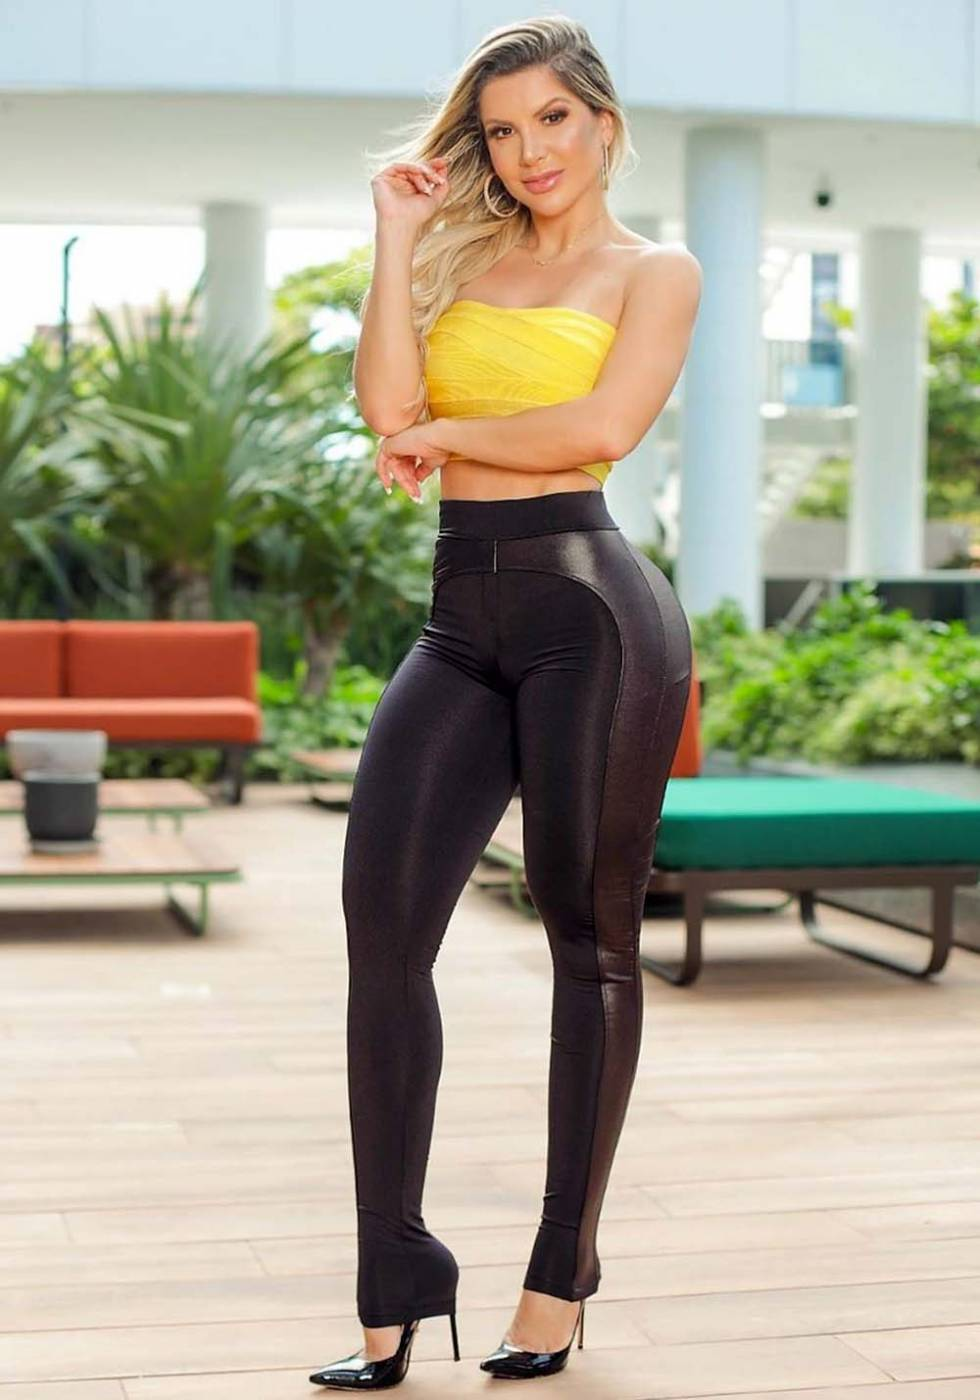 Calça Legging Modeladora com Faixa Preta 01 - Empina Bumbum e Comprime a Barriga